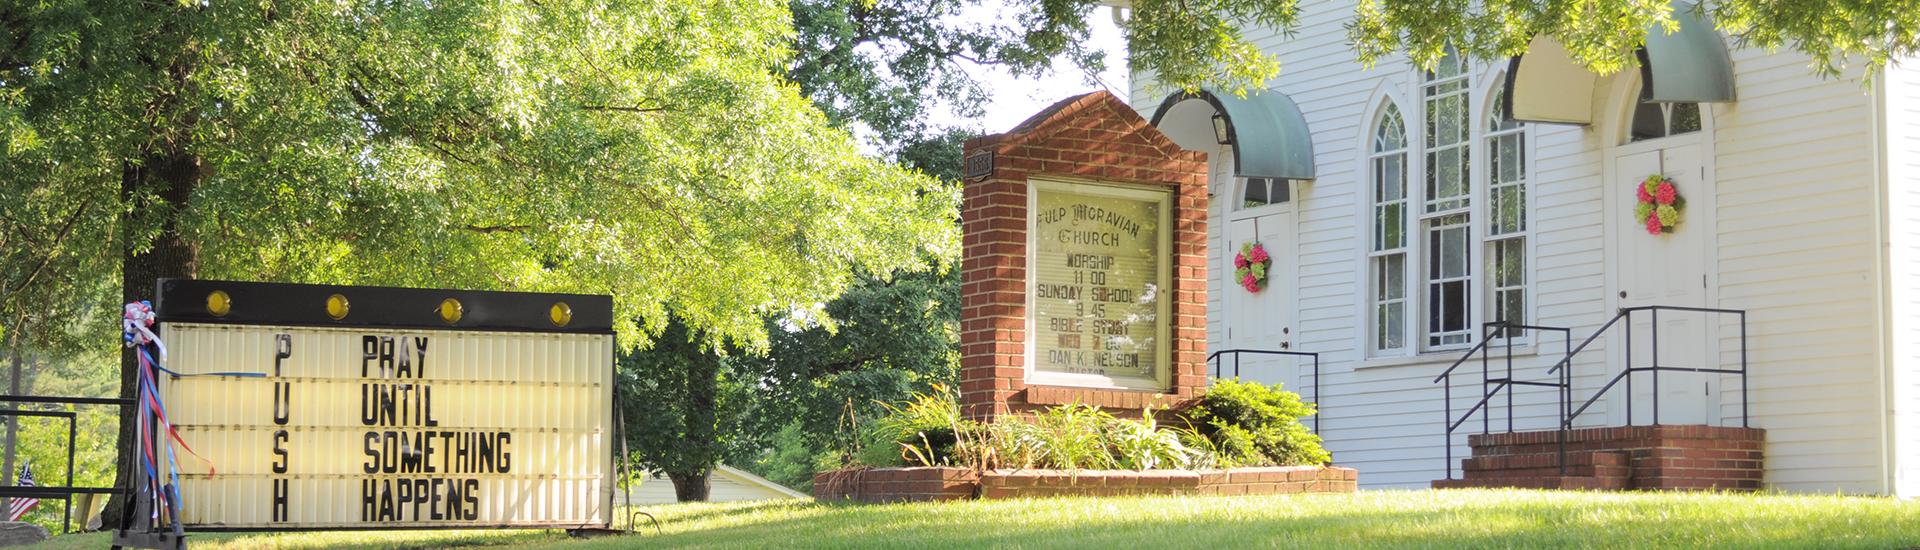 Welcome to Fulp Moravian Church